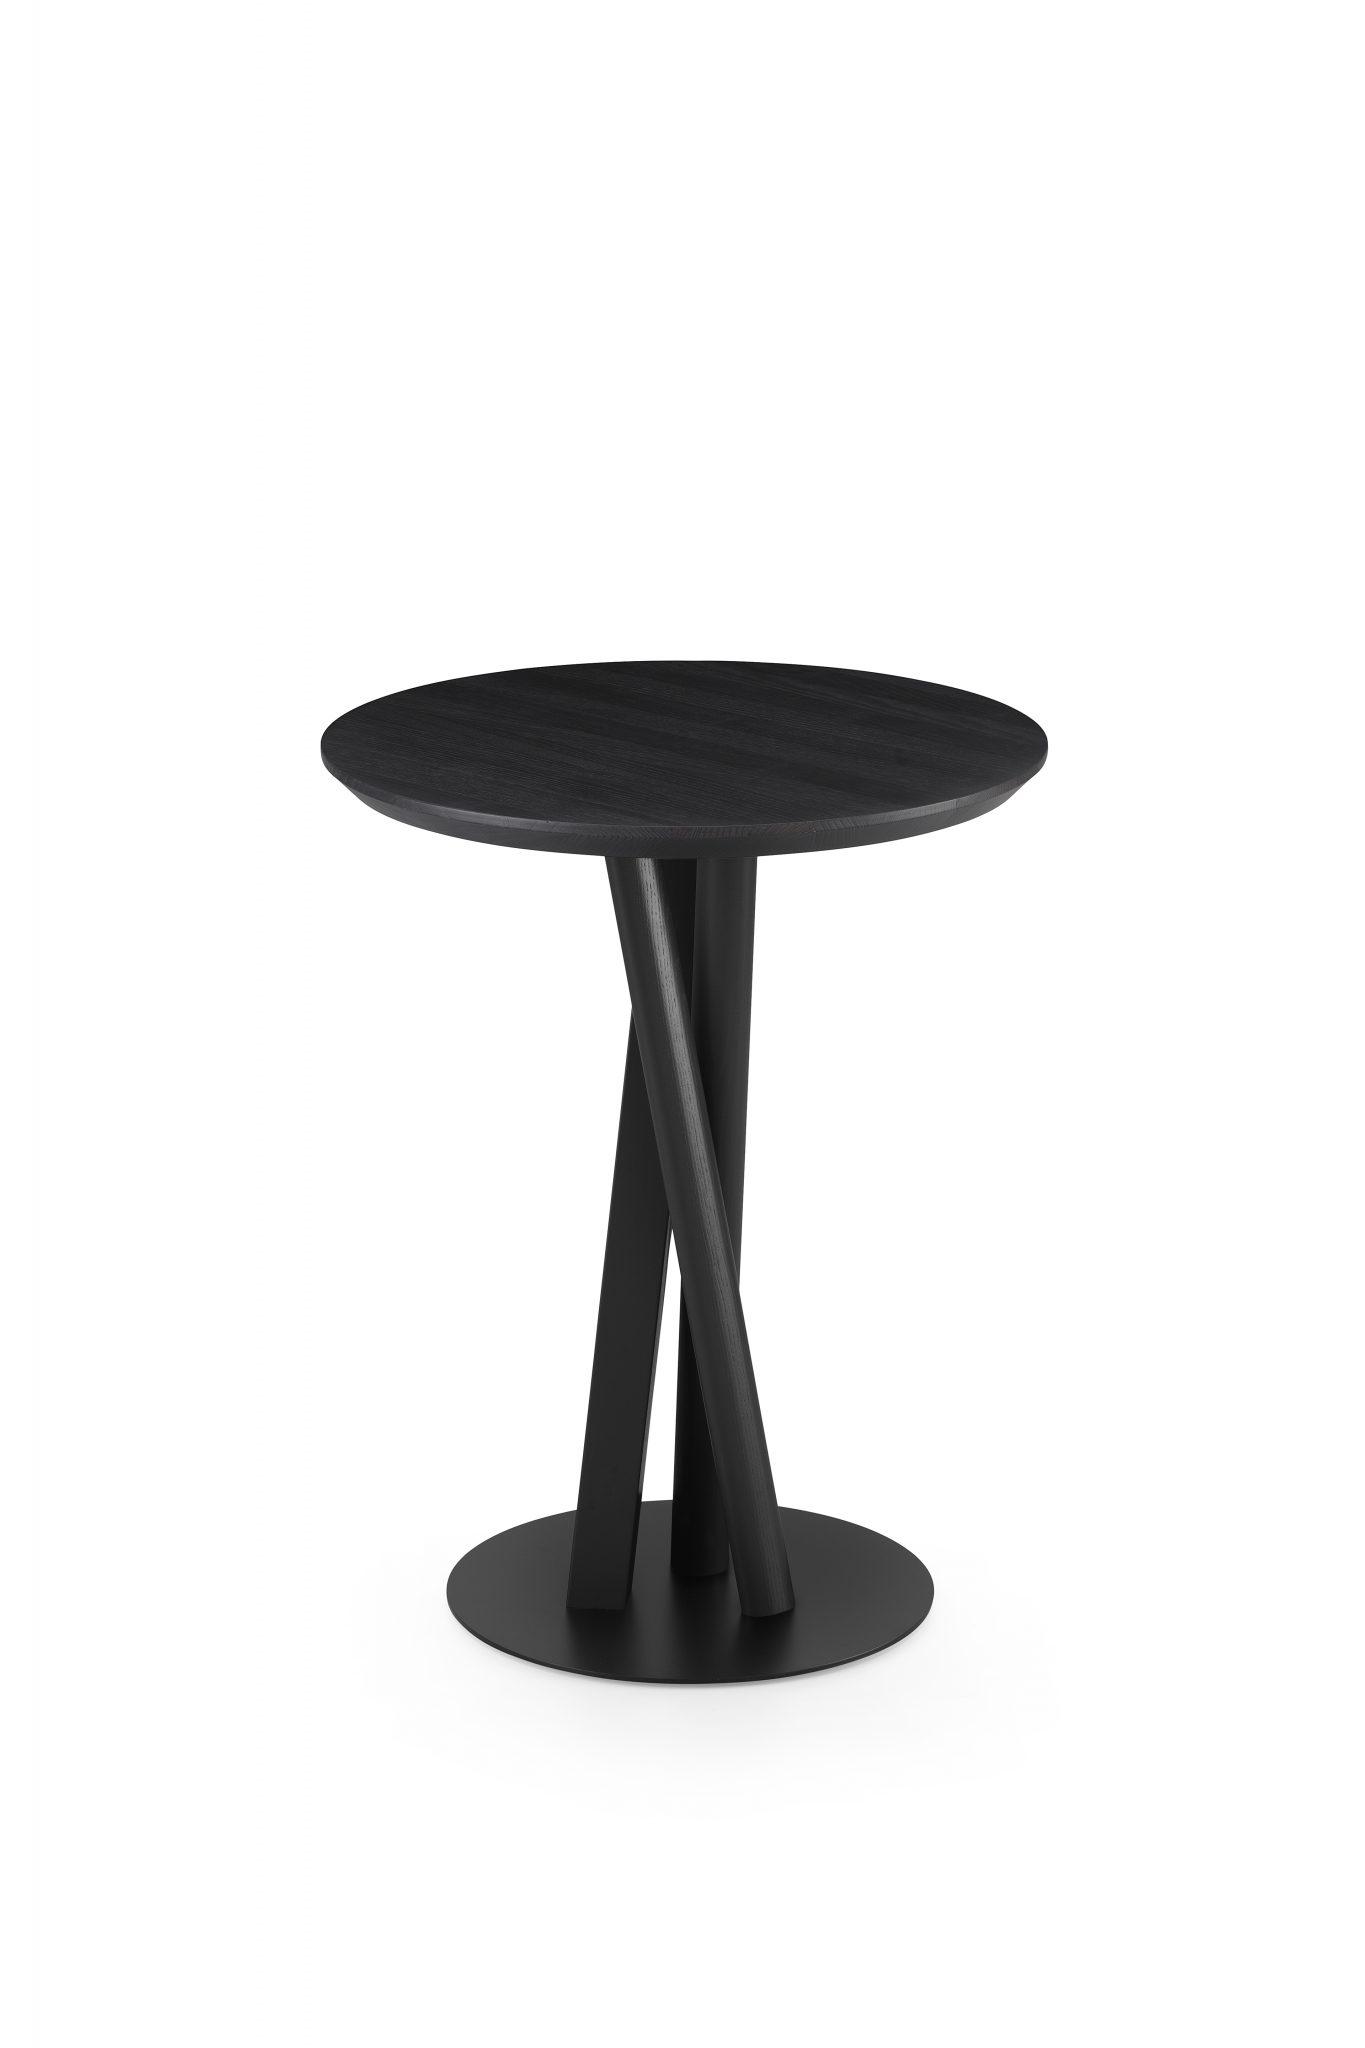 00123-R NIELS TABLE